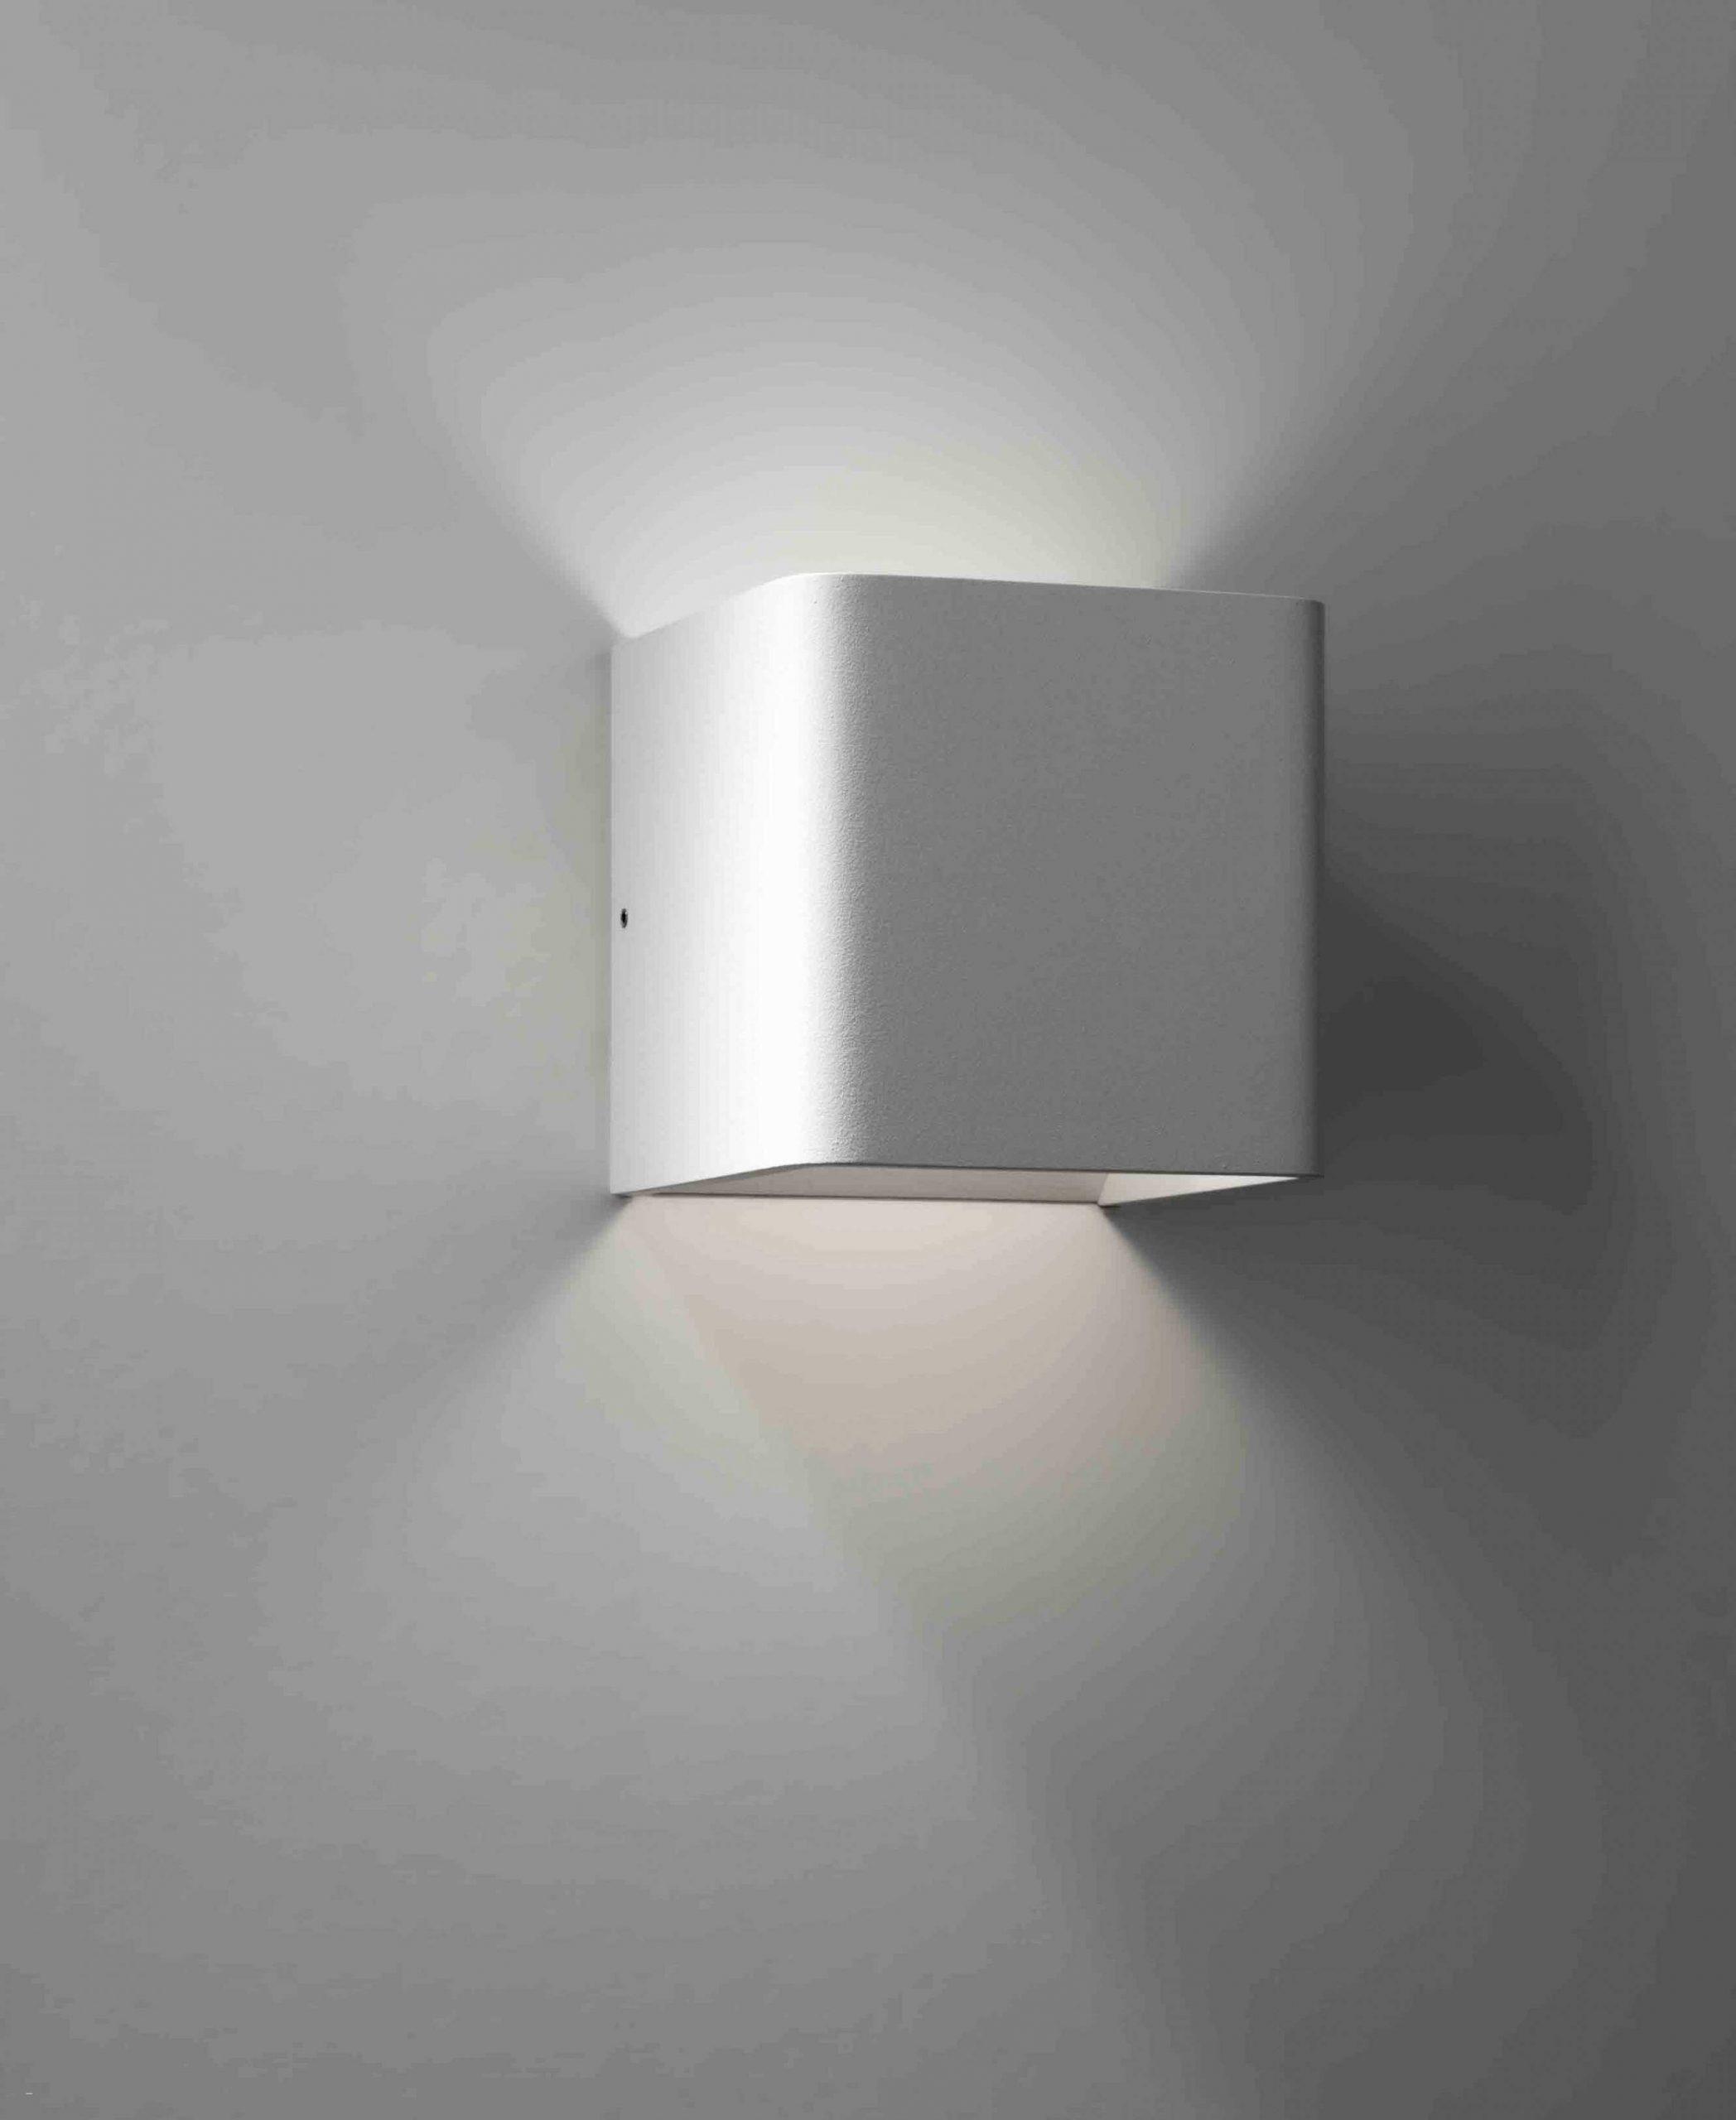 Full Size of Xyzs Wandlampe Kreative Neue Chinesische Wand Lampe Einfache Schlafzimmer Stuhl Günstig Badezimmer Landhausstil Regal Kommode Weiß Deckenlampe Lampen Rauch Schlafzimmer Lampe Schlafzimmer